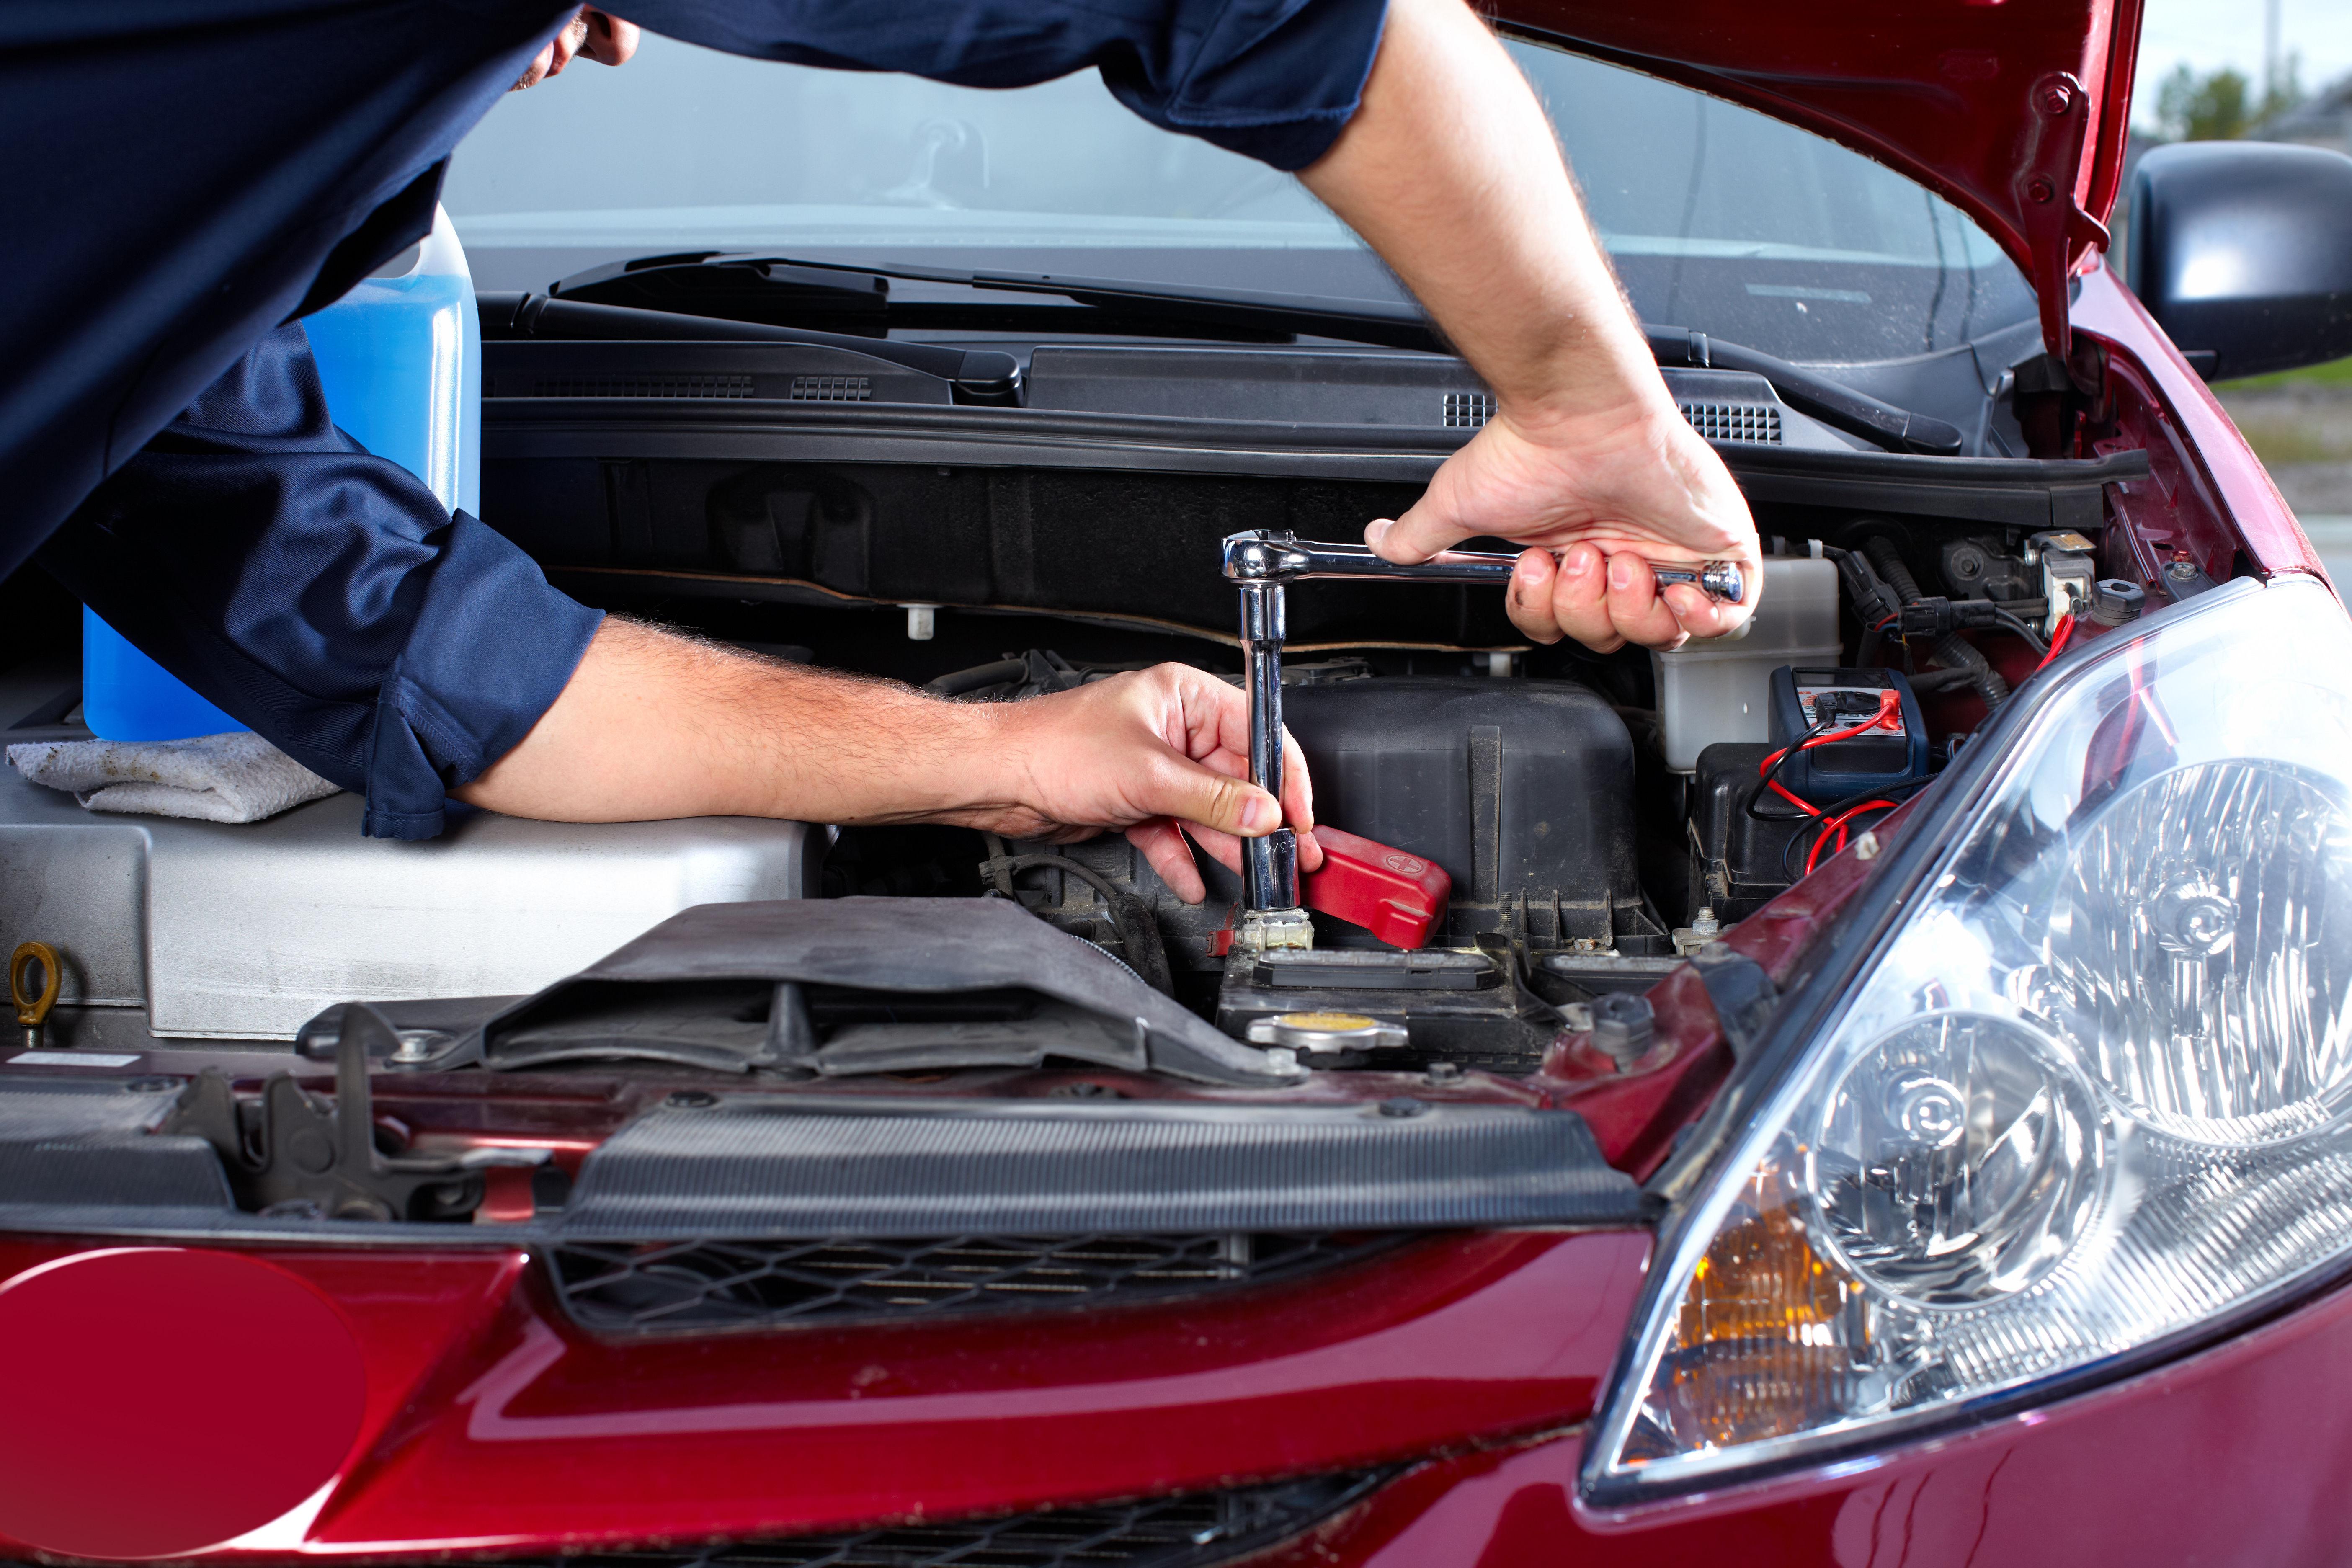 Asian car repair services california, free squirting lesbian pussy vids